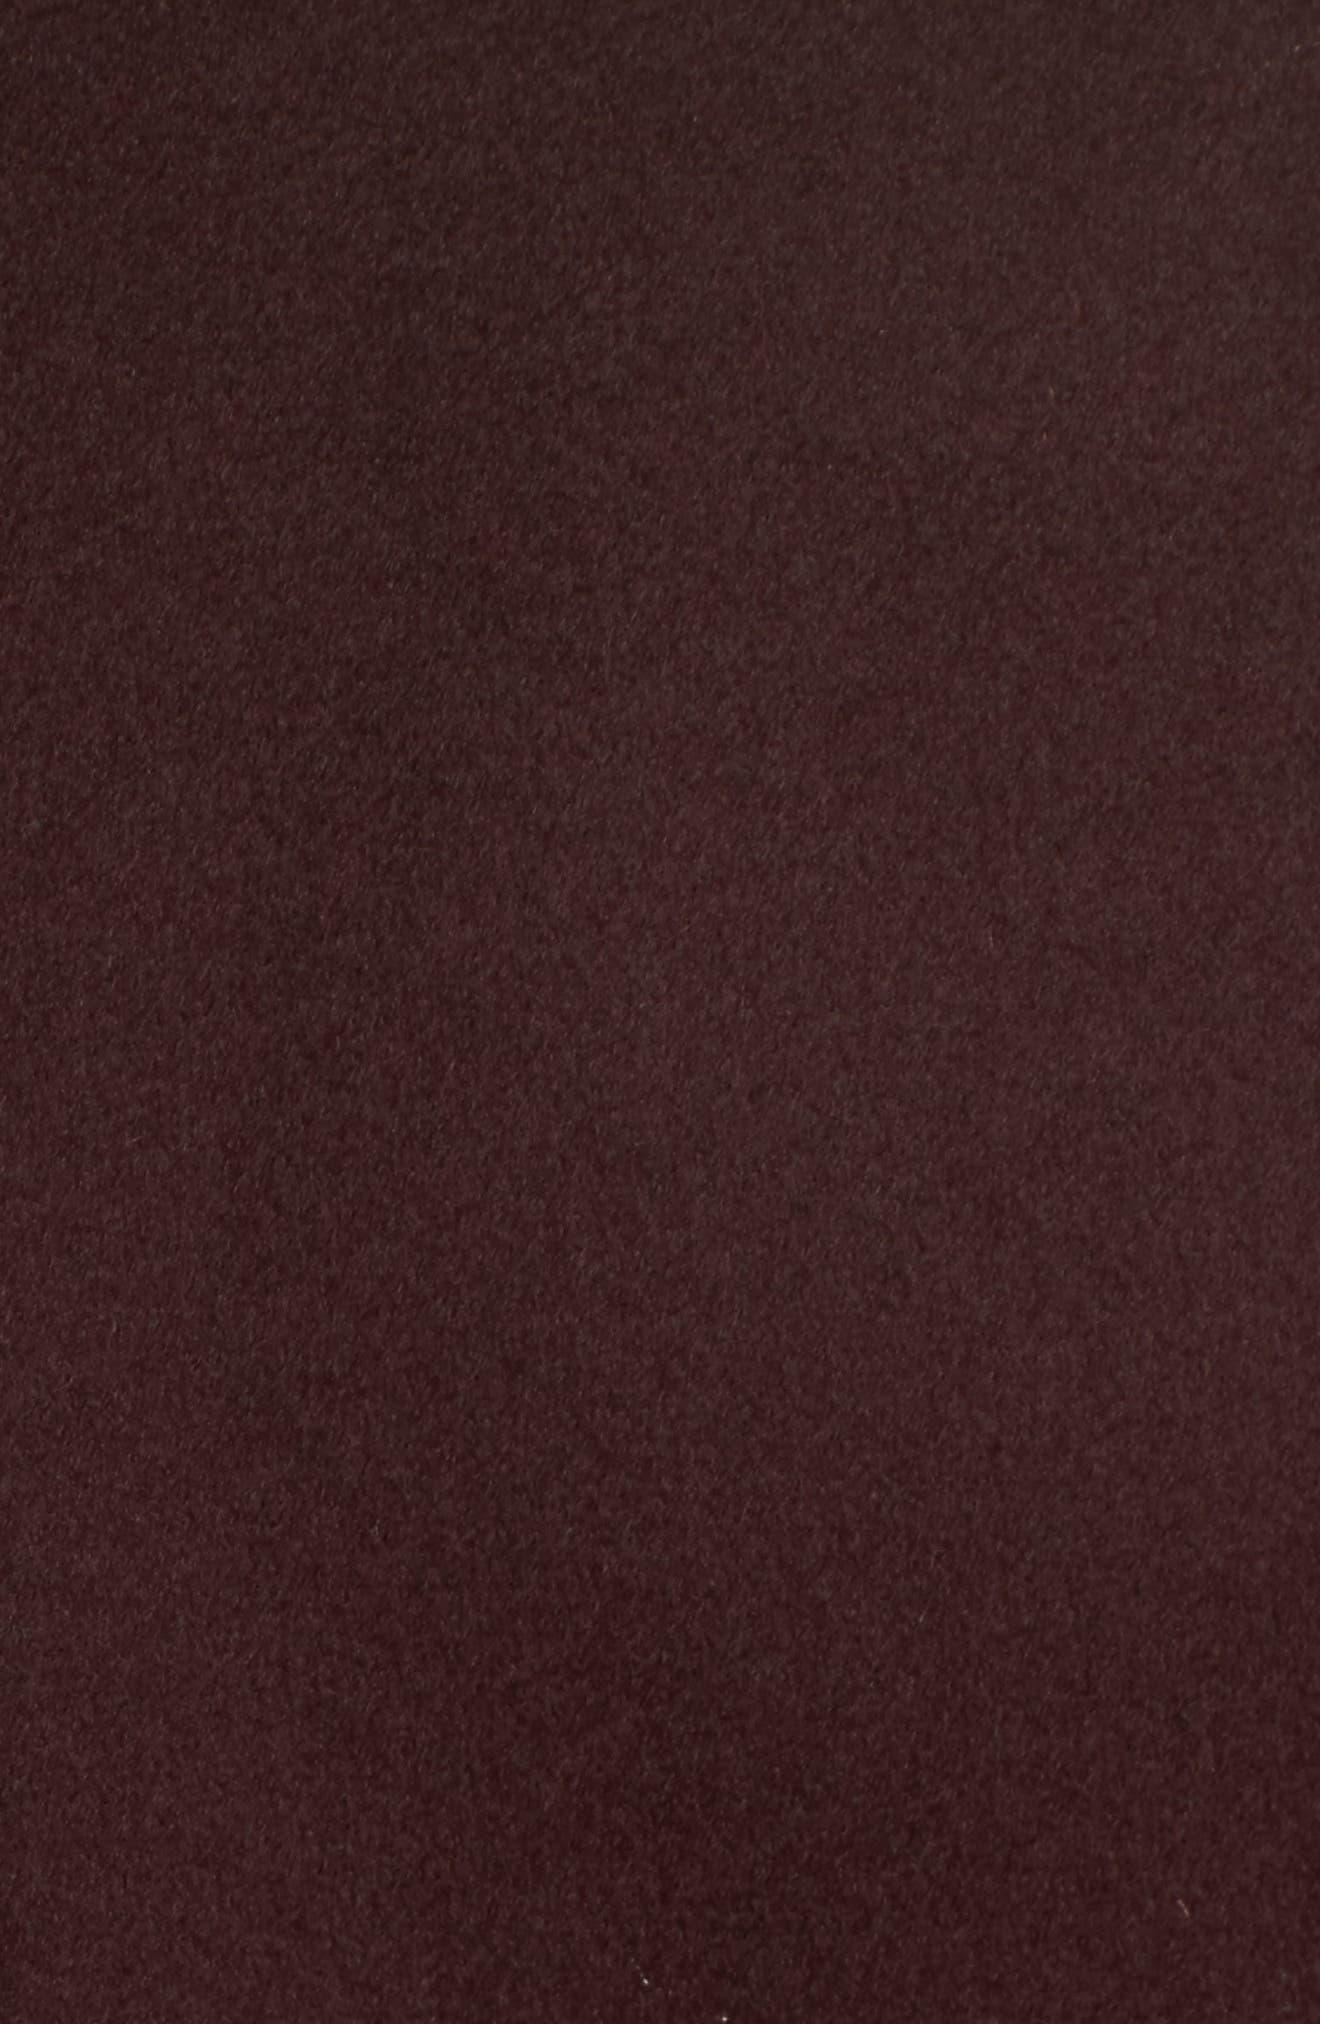 Luna Wool Blend Wrap Coat,                             Alternate thumbnail 12, color,